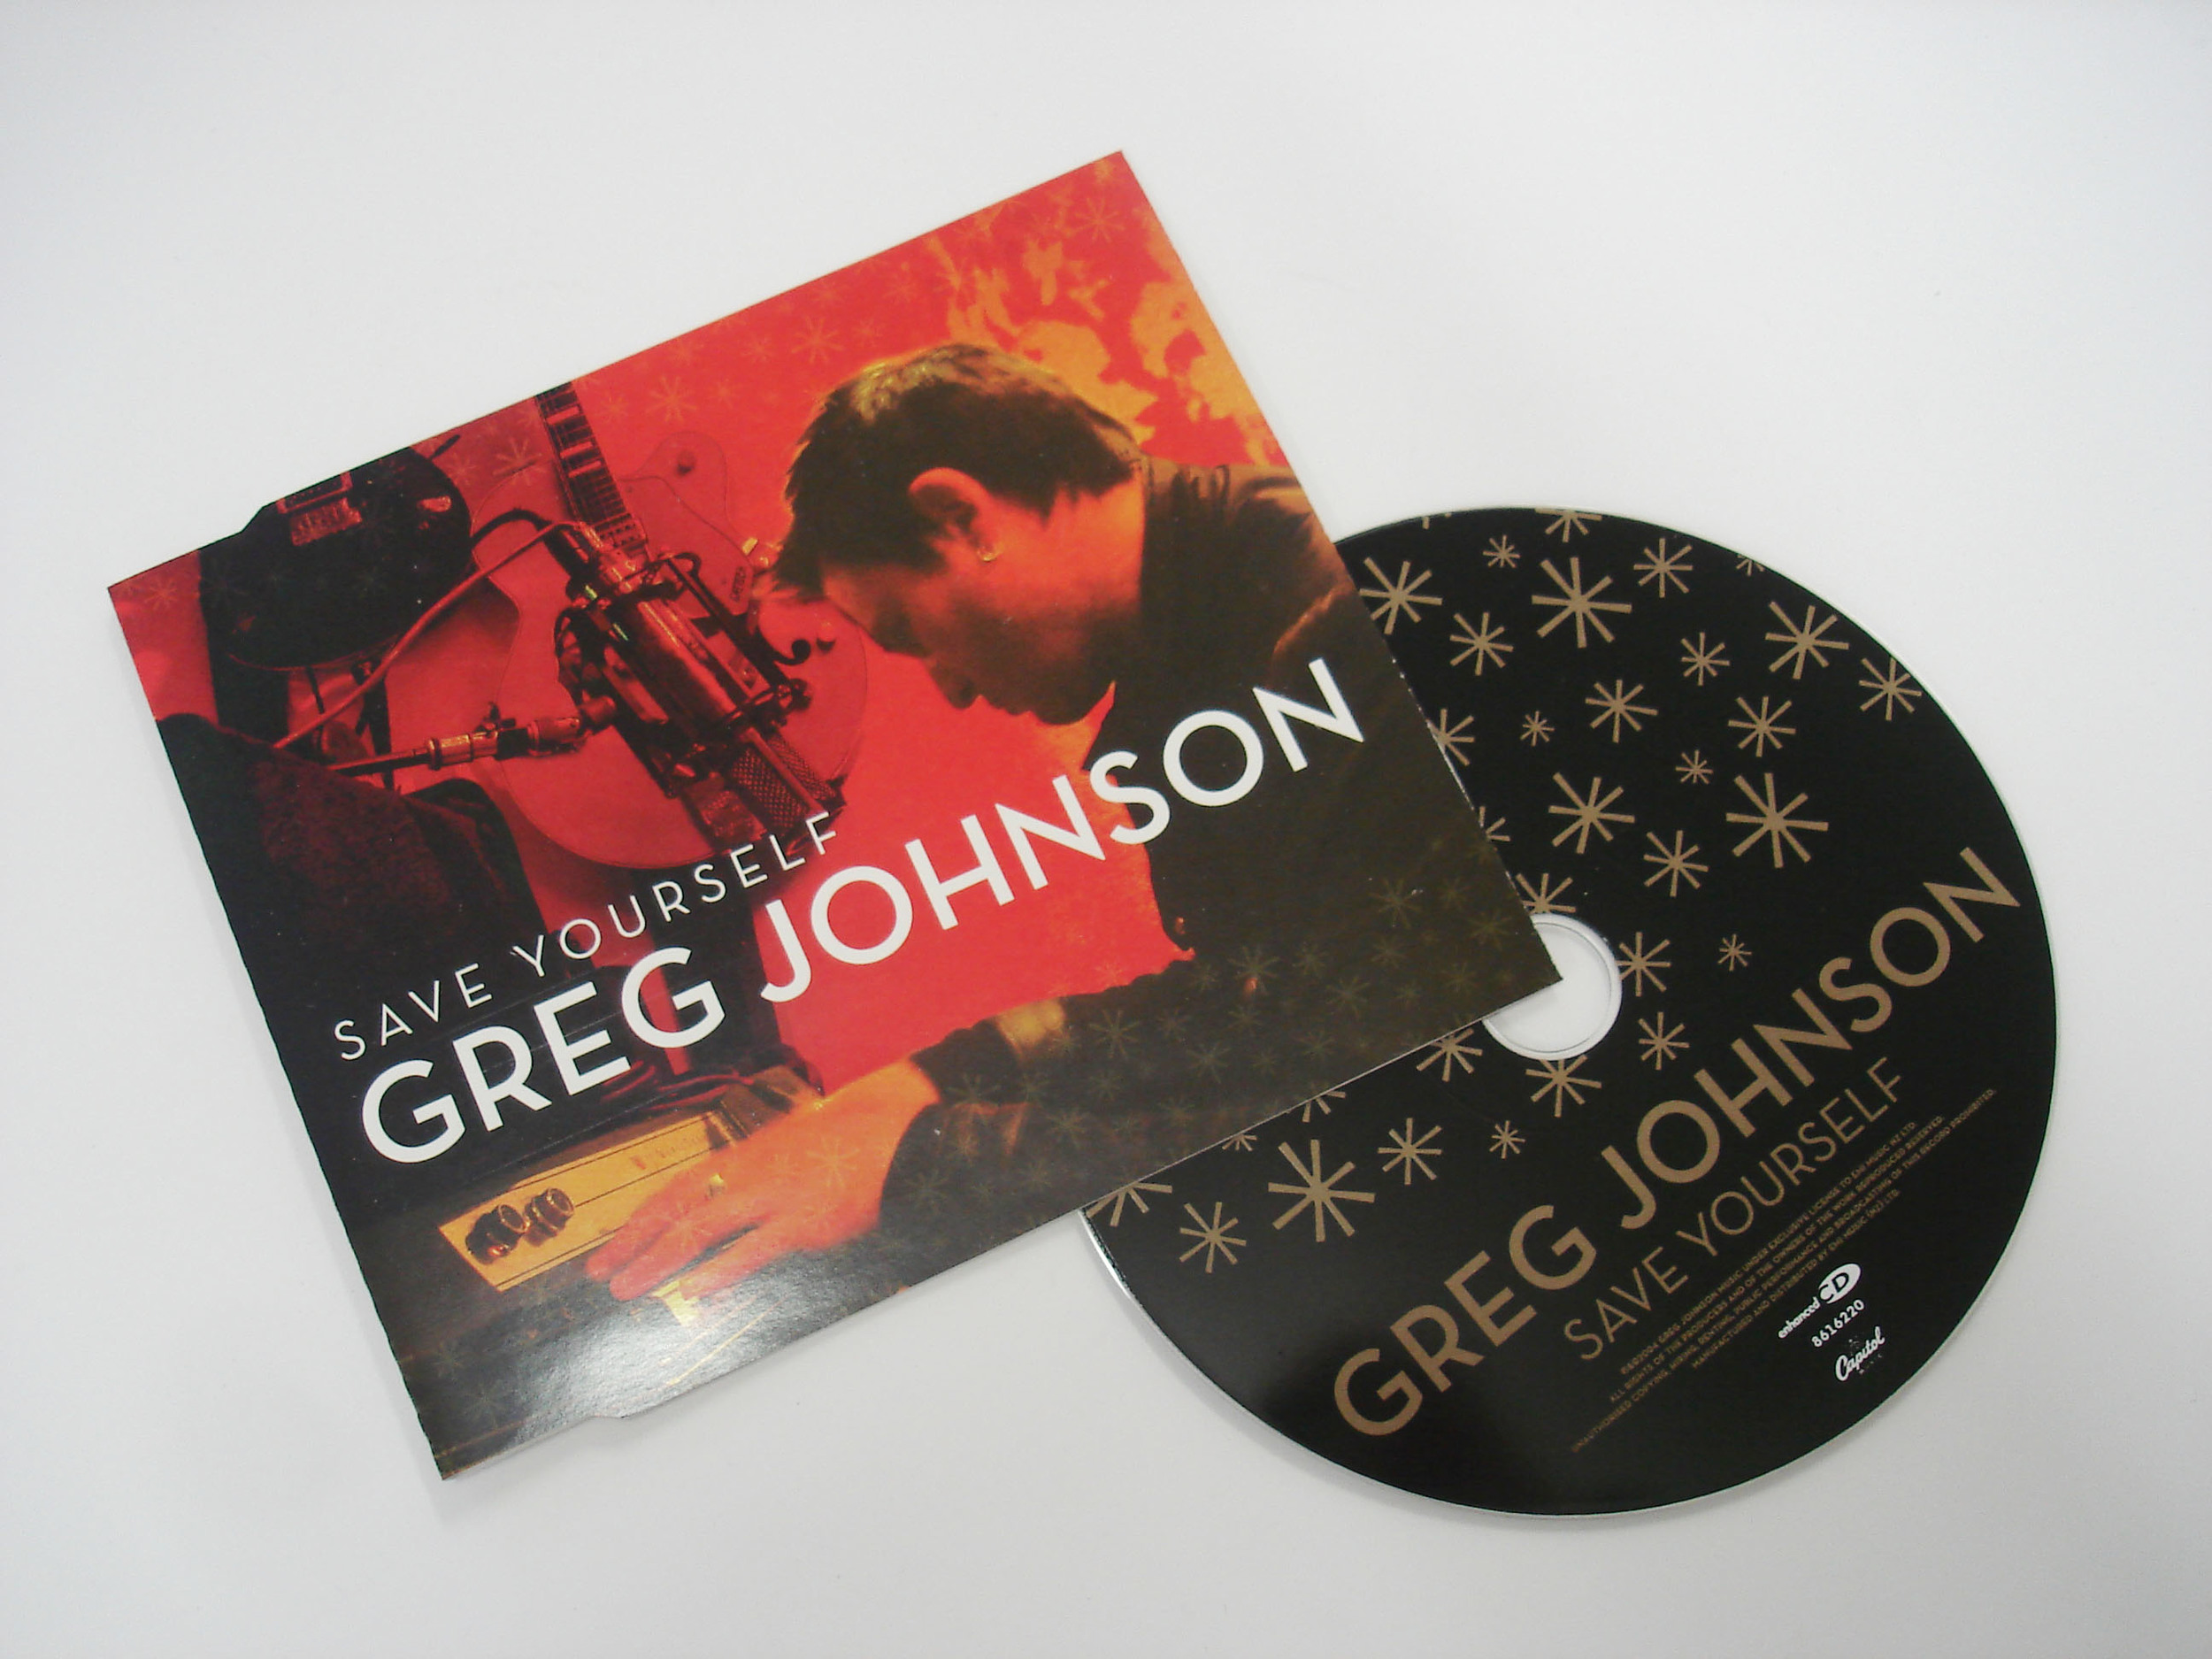 GREG JOHNSON - SAVE YOURSELF - SINGLE